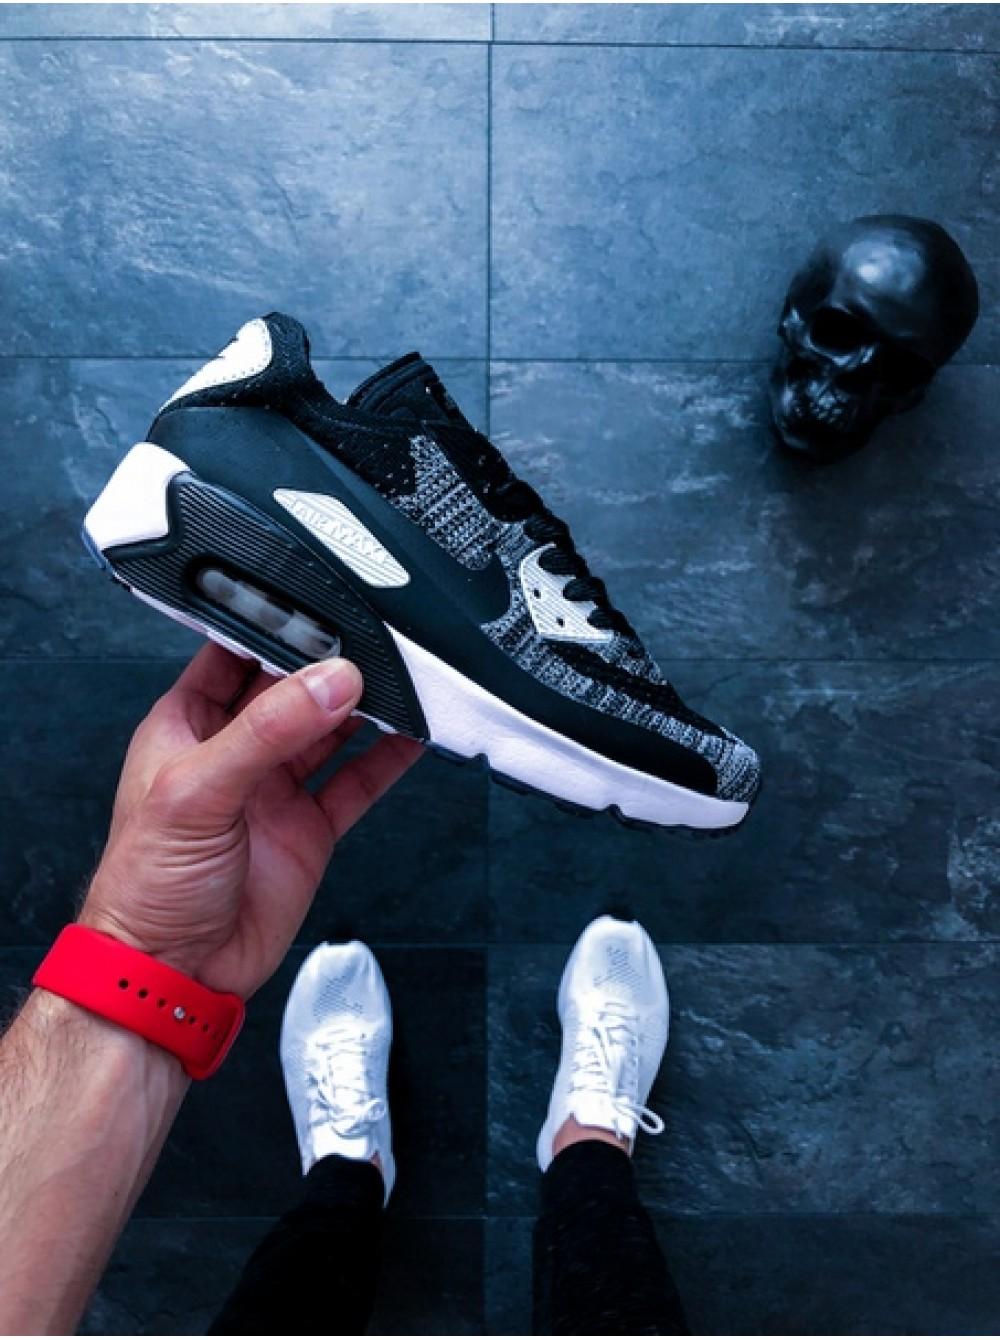 Nike Air Max 90 Ultra 2.0 Flyknit Oreo